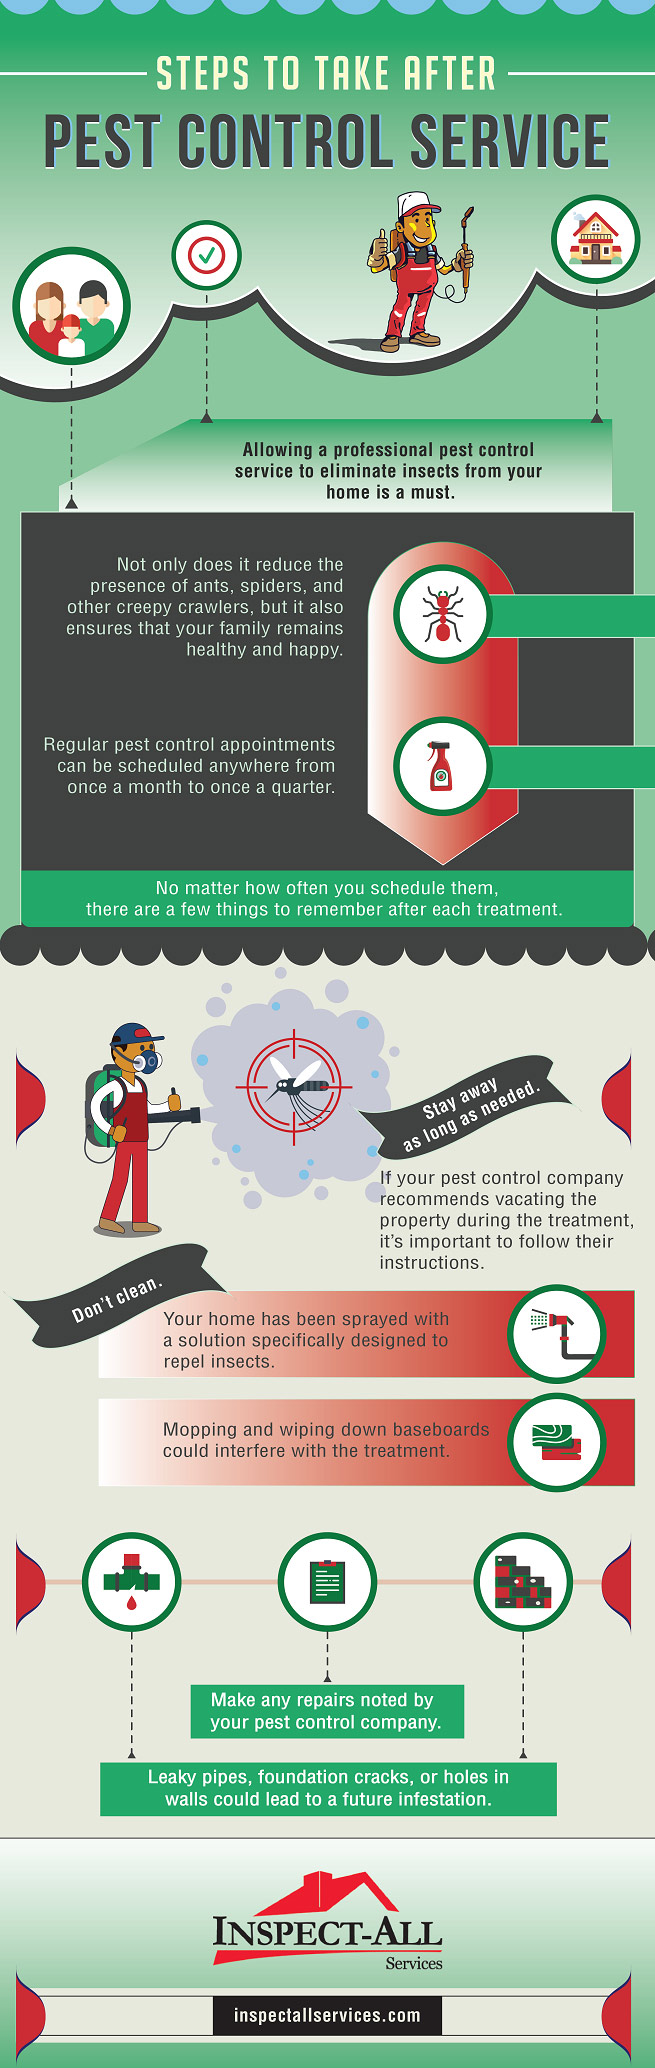 steps-after-pest-service-graphic-753999920.jpg